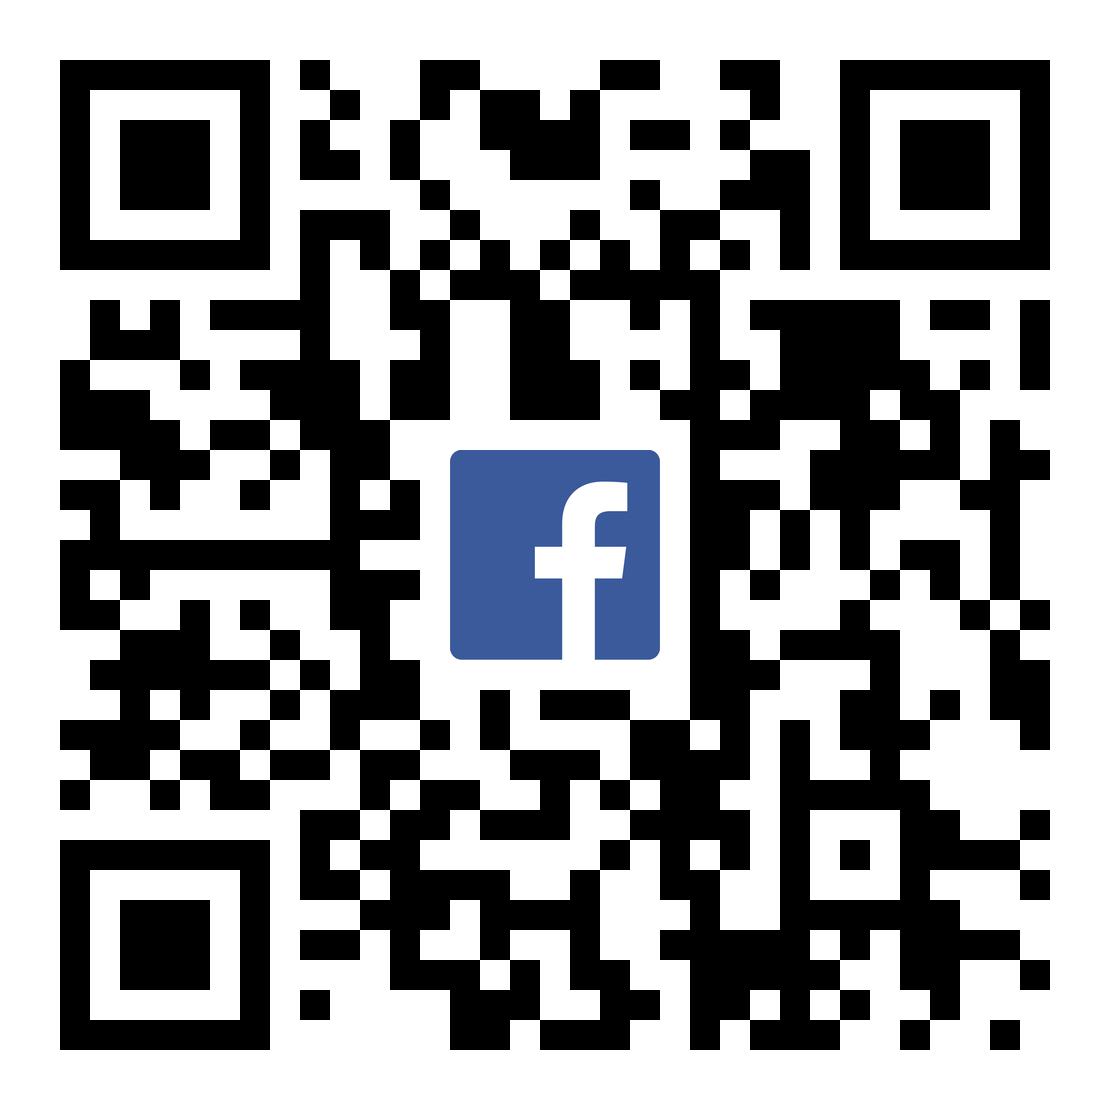 forbes-of-kingennie-facebook-event.jpg